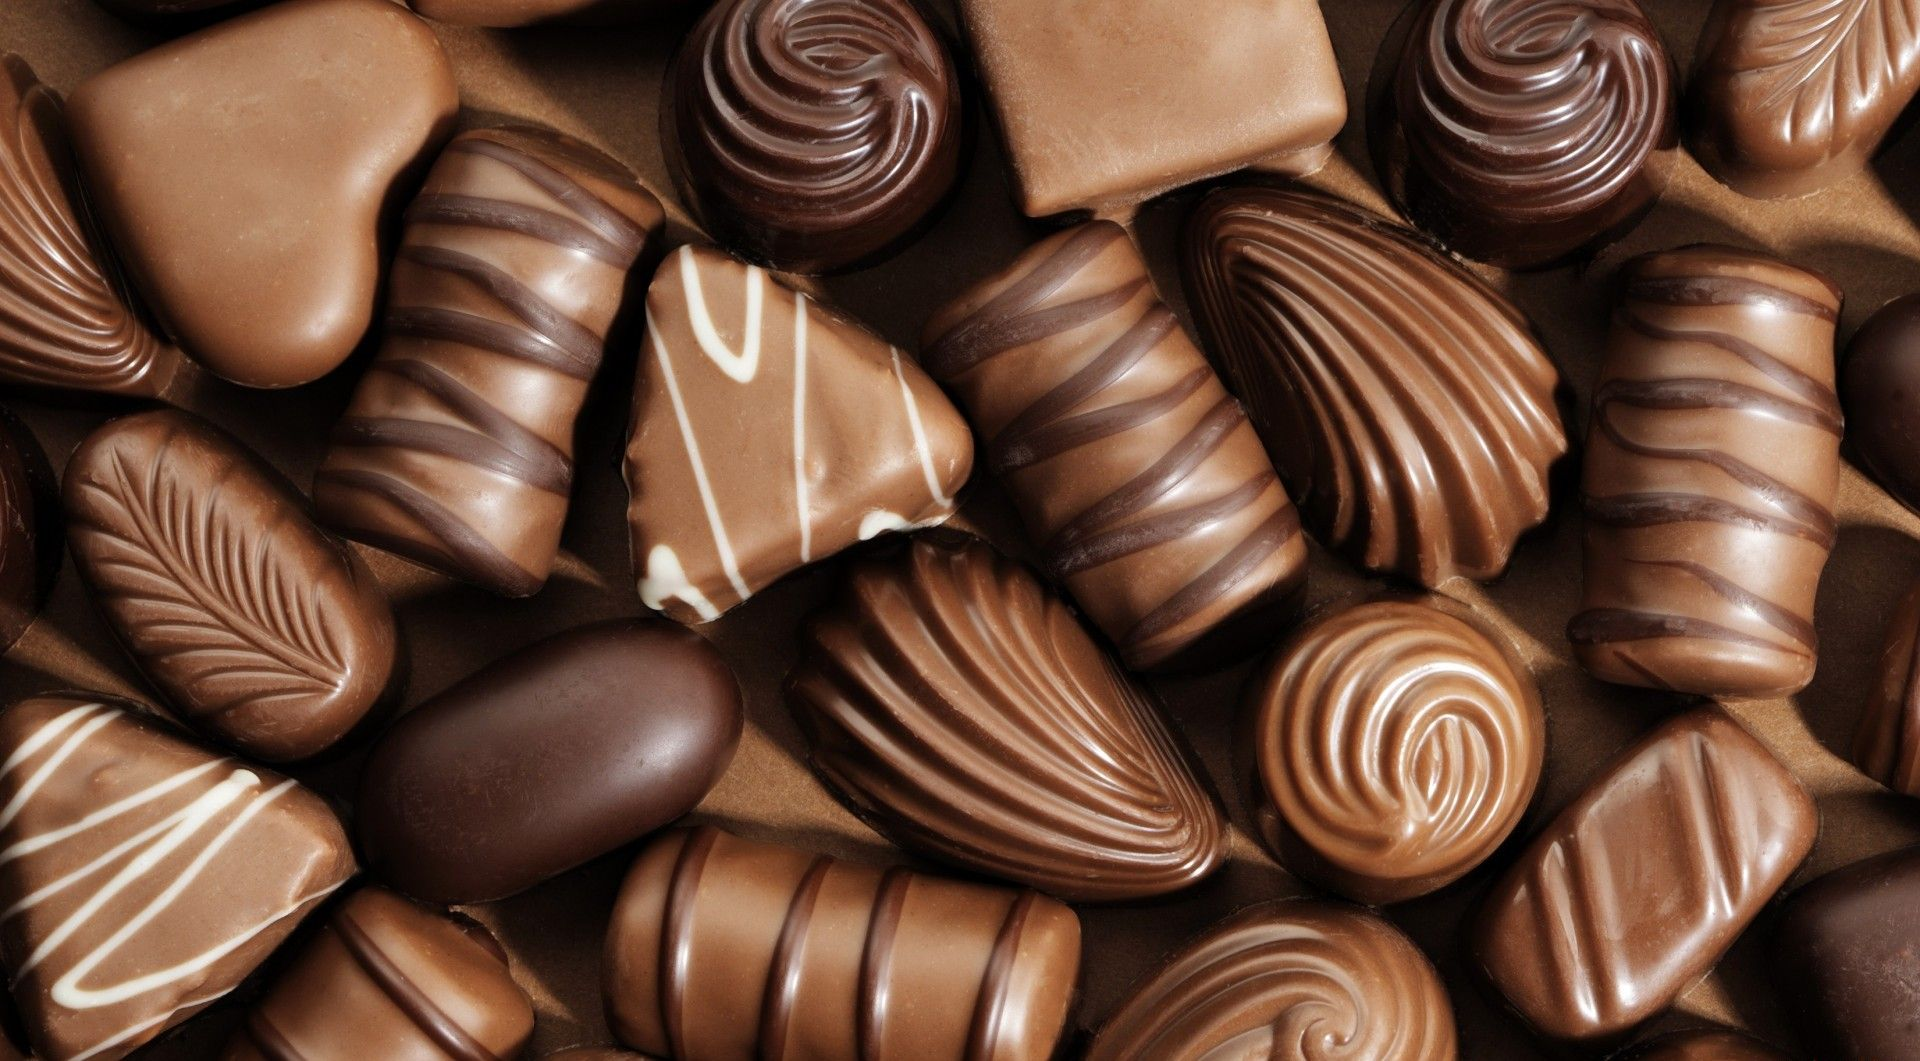 Chocolate Wallpaper Chocolate Chocolate Sweets Chocolate Chocolate Day